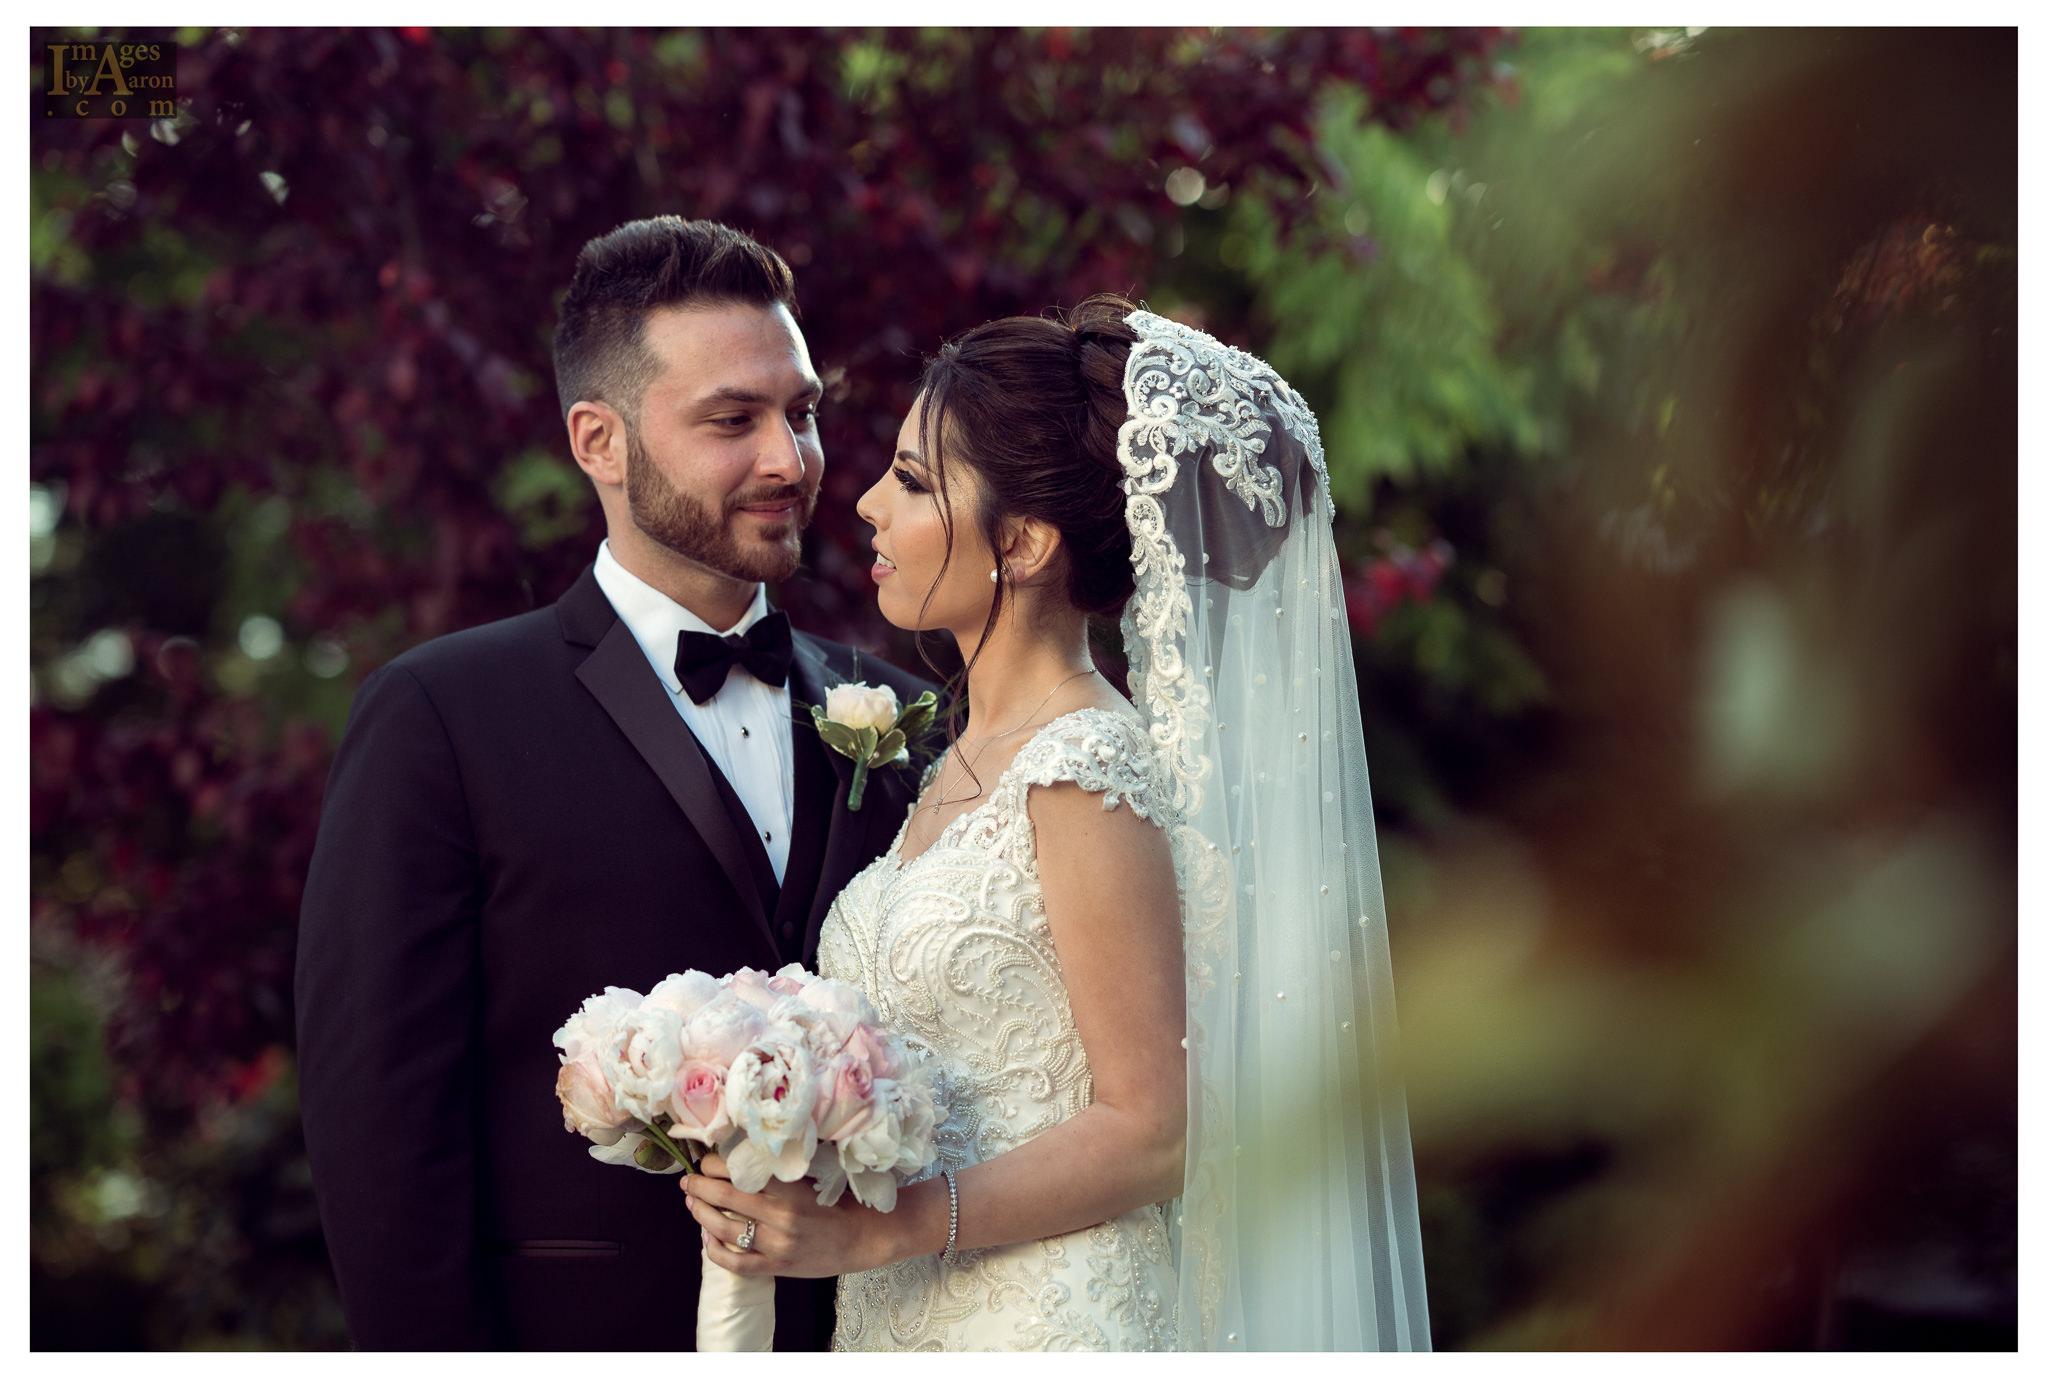 Gokce Turkish Wedding Portraits New York Photography The Royal Manor-12.jpg